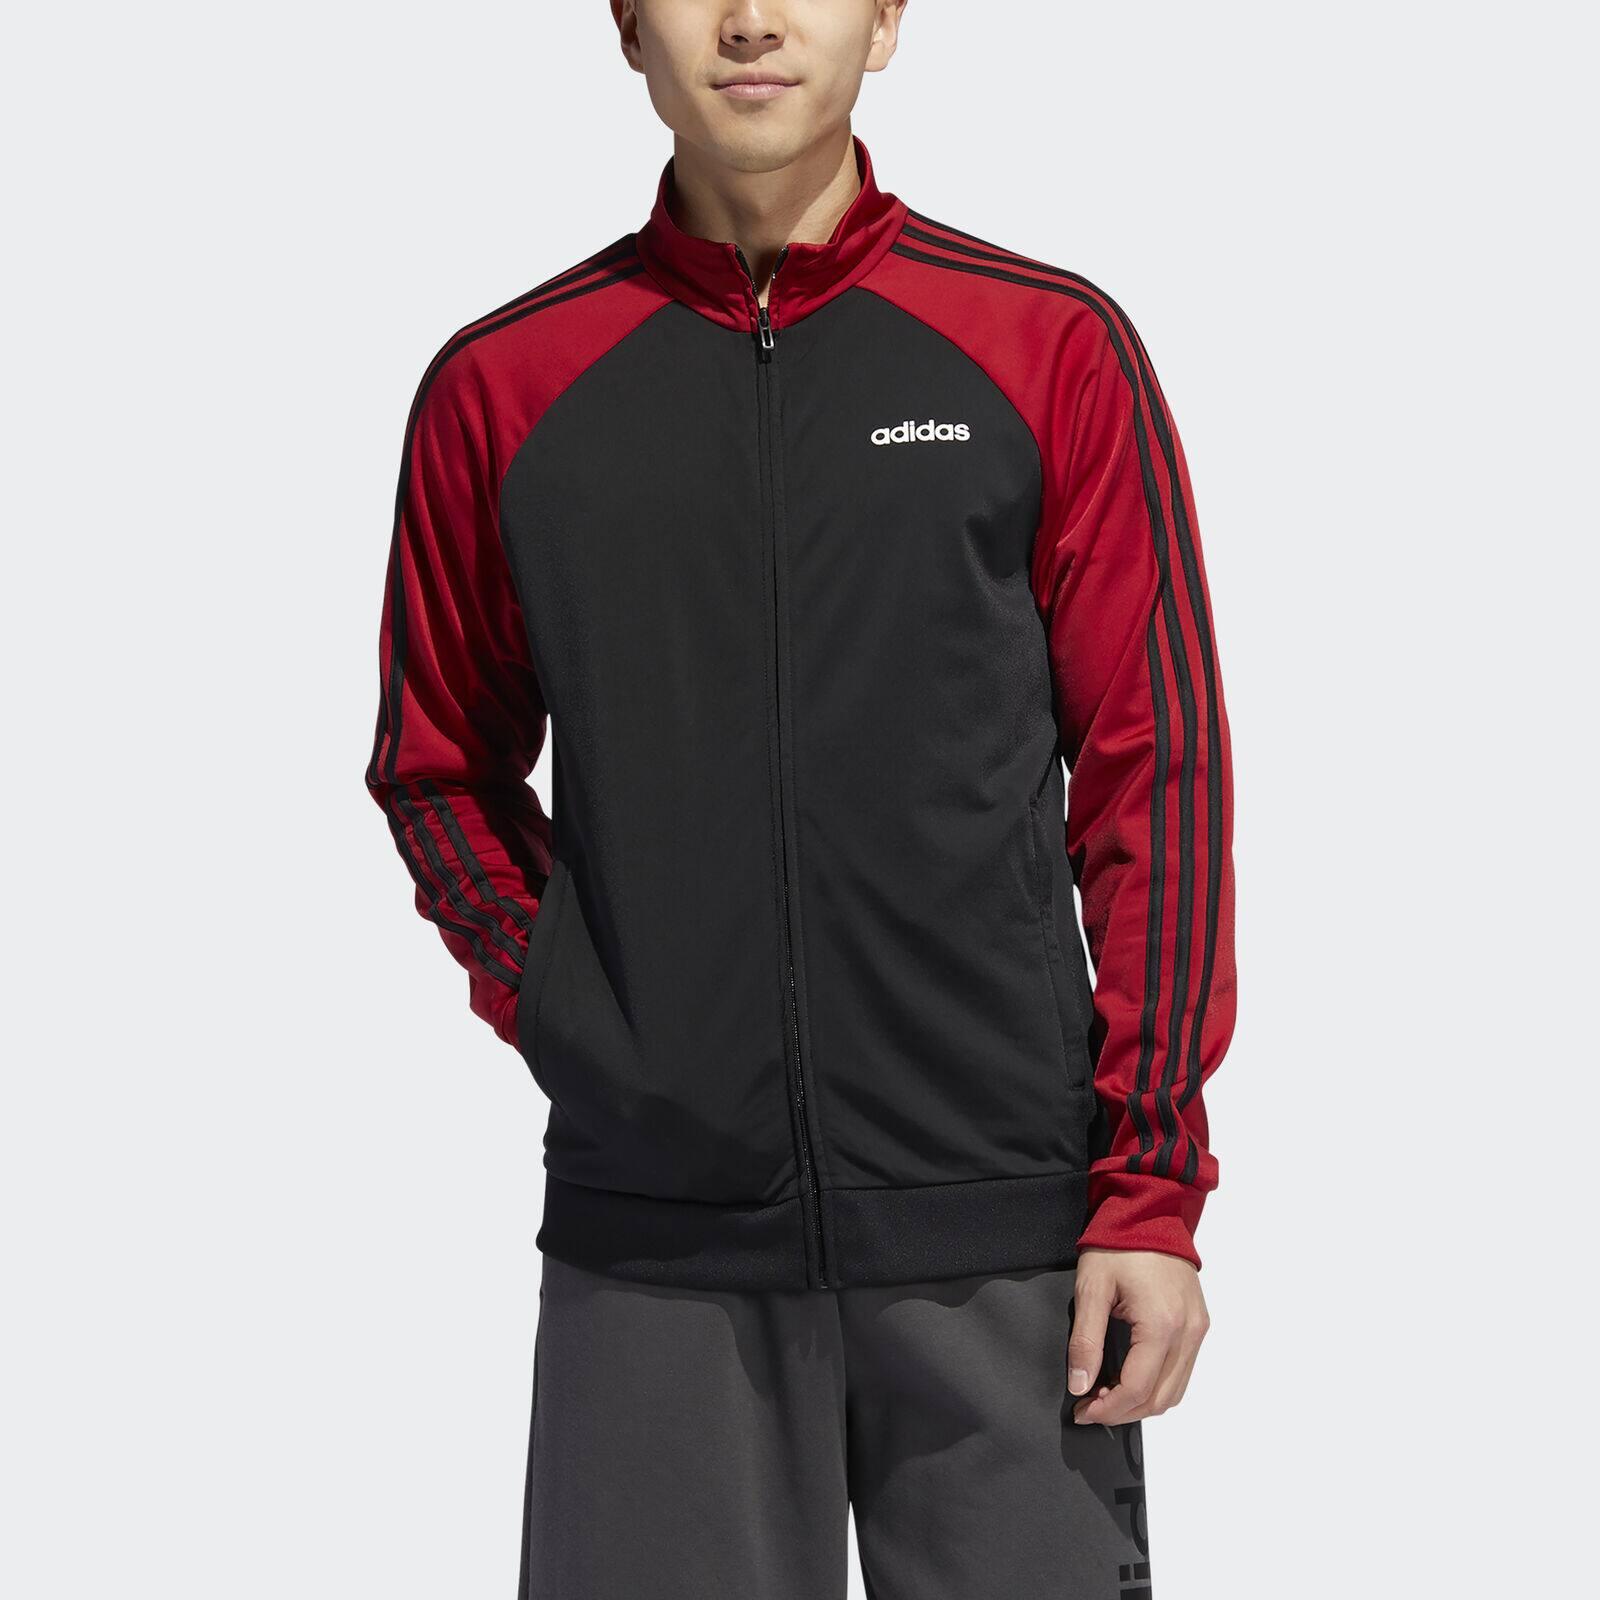 adidas Essentials Men's 3-Stripes Track Jacket  (Black / Maroon)